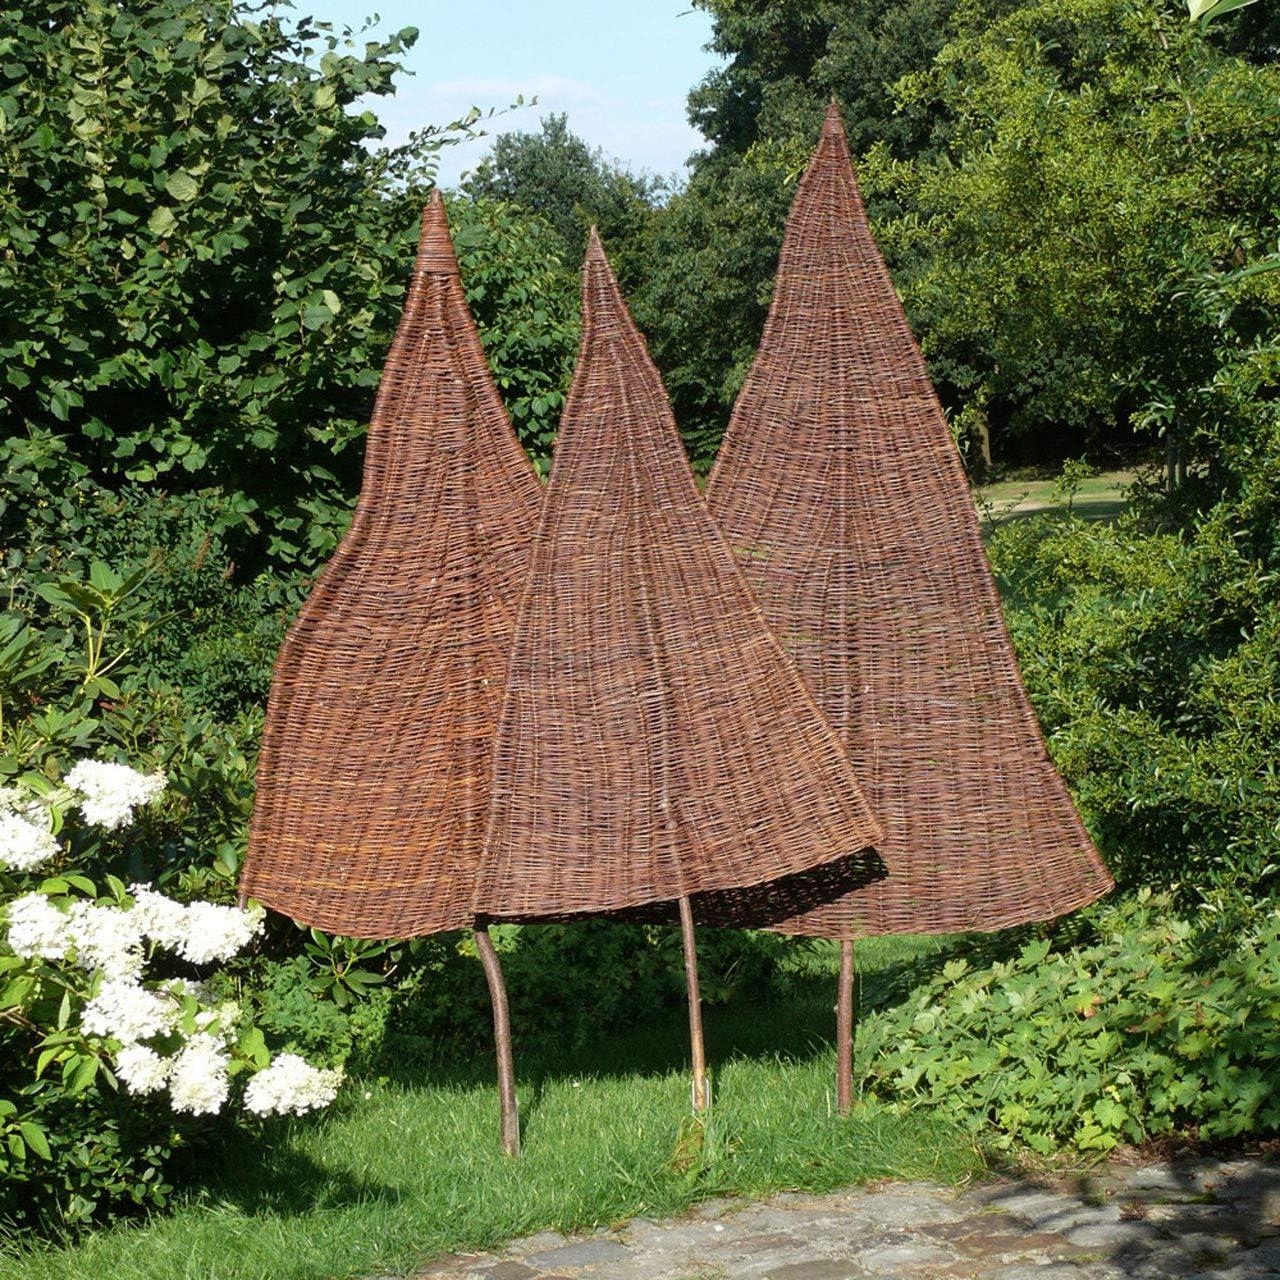 Videx Sichtschutz Weidenbaum Tanne Gross Natur Ca B 110cm X H